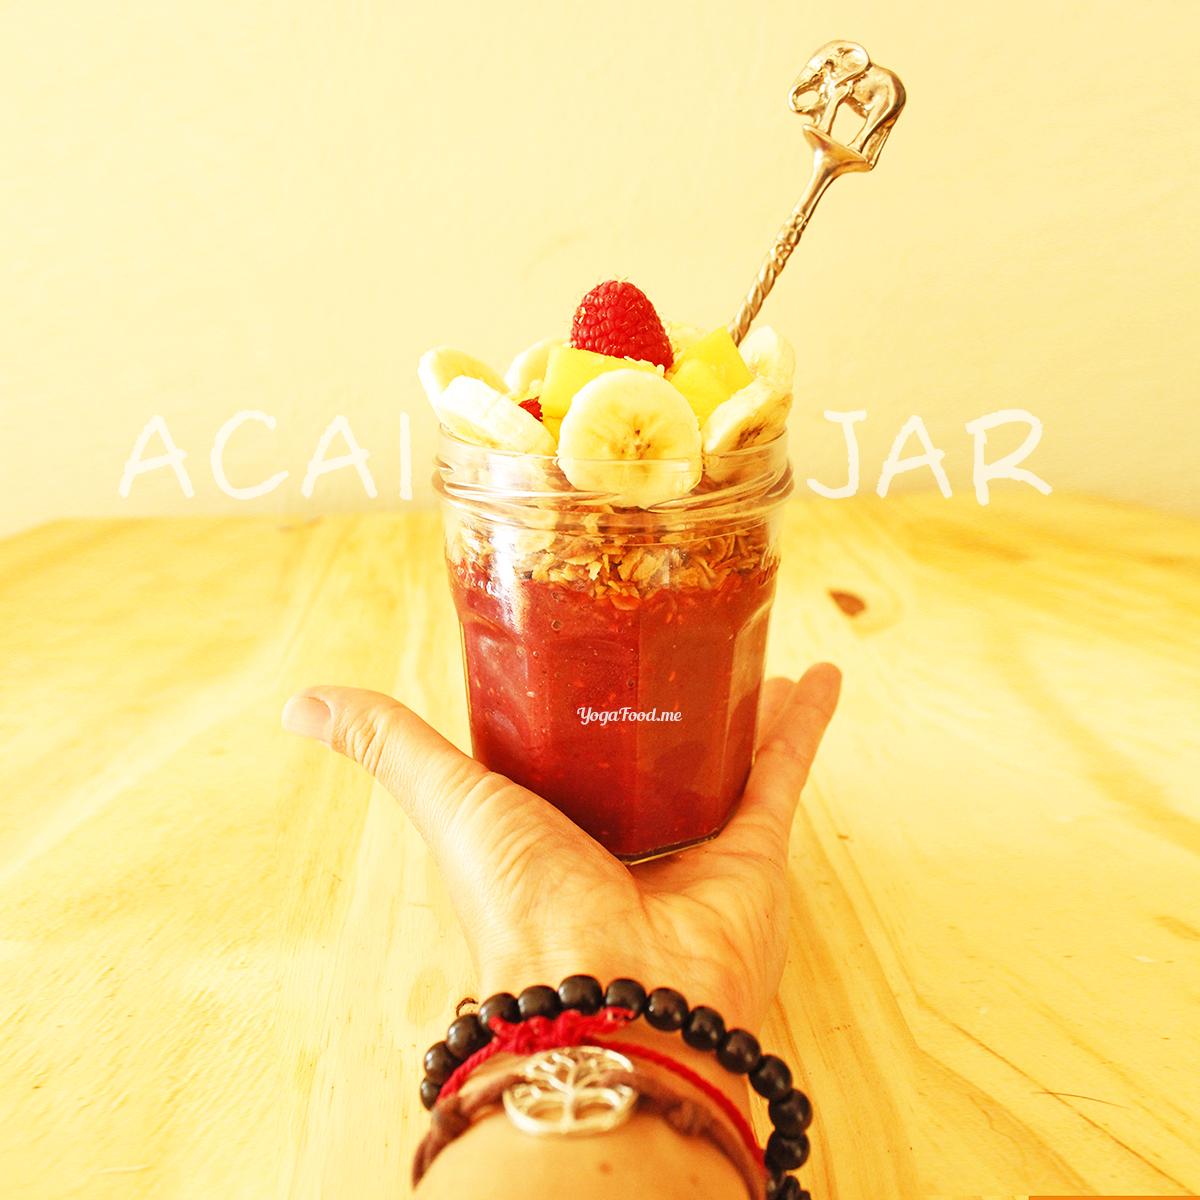 Raspberry Mango Acai Jar